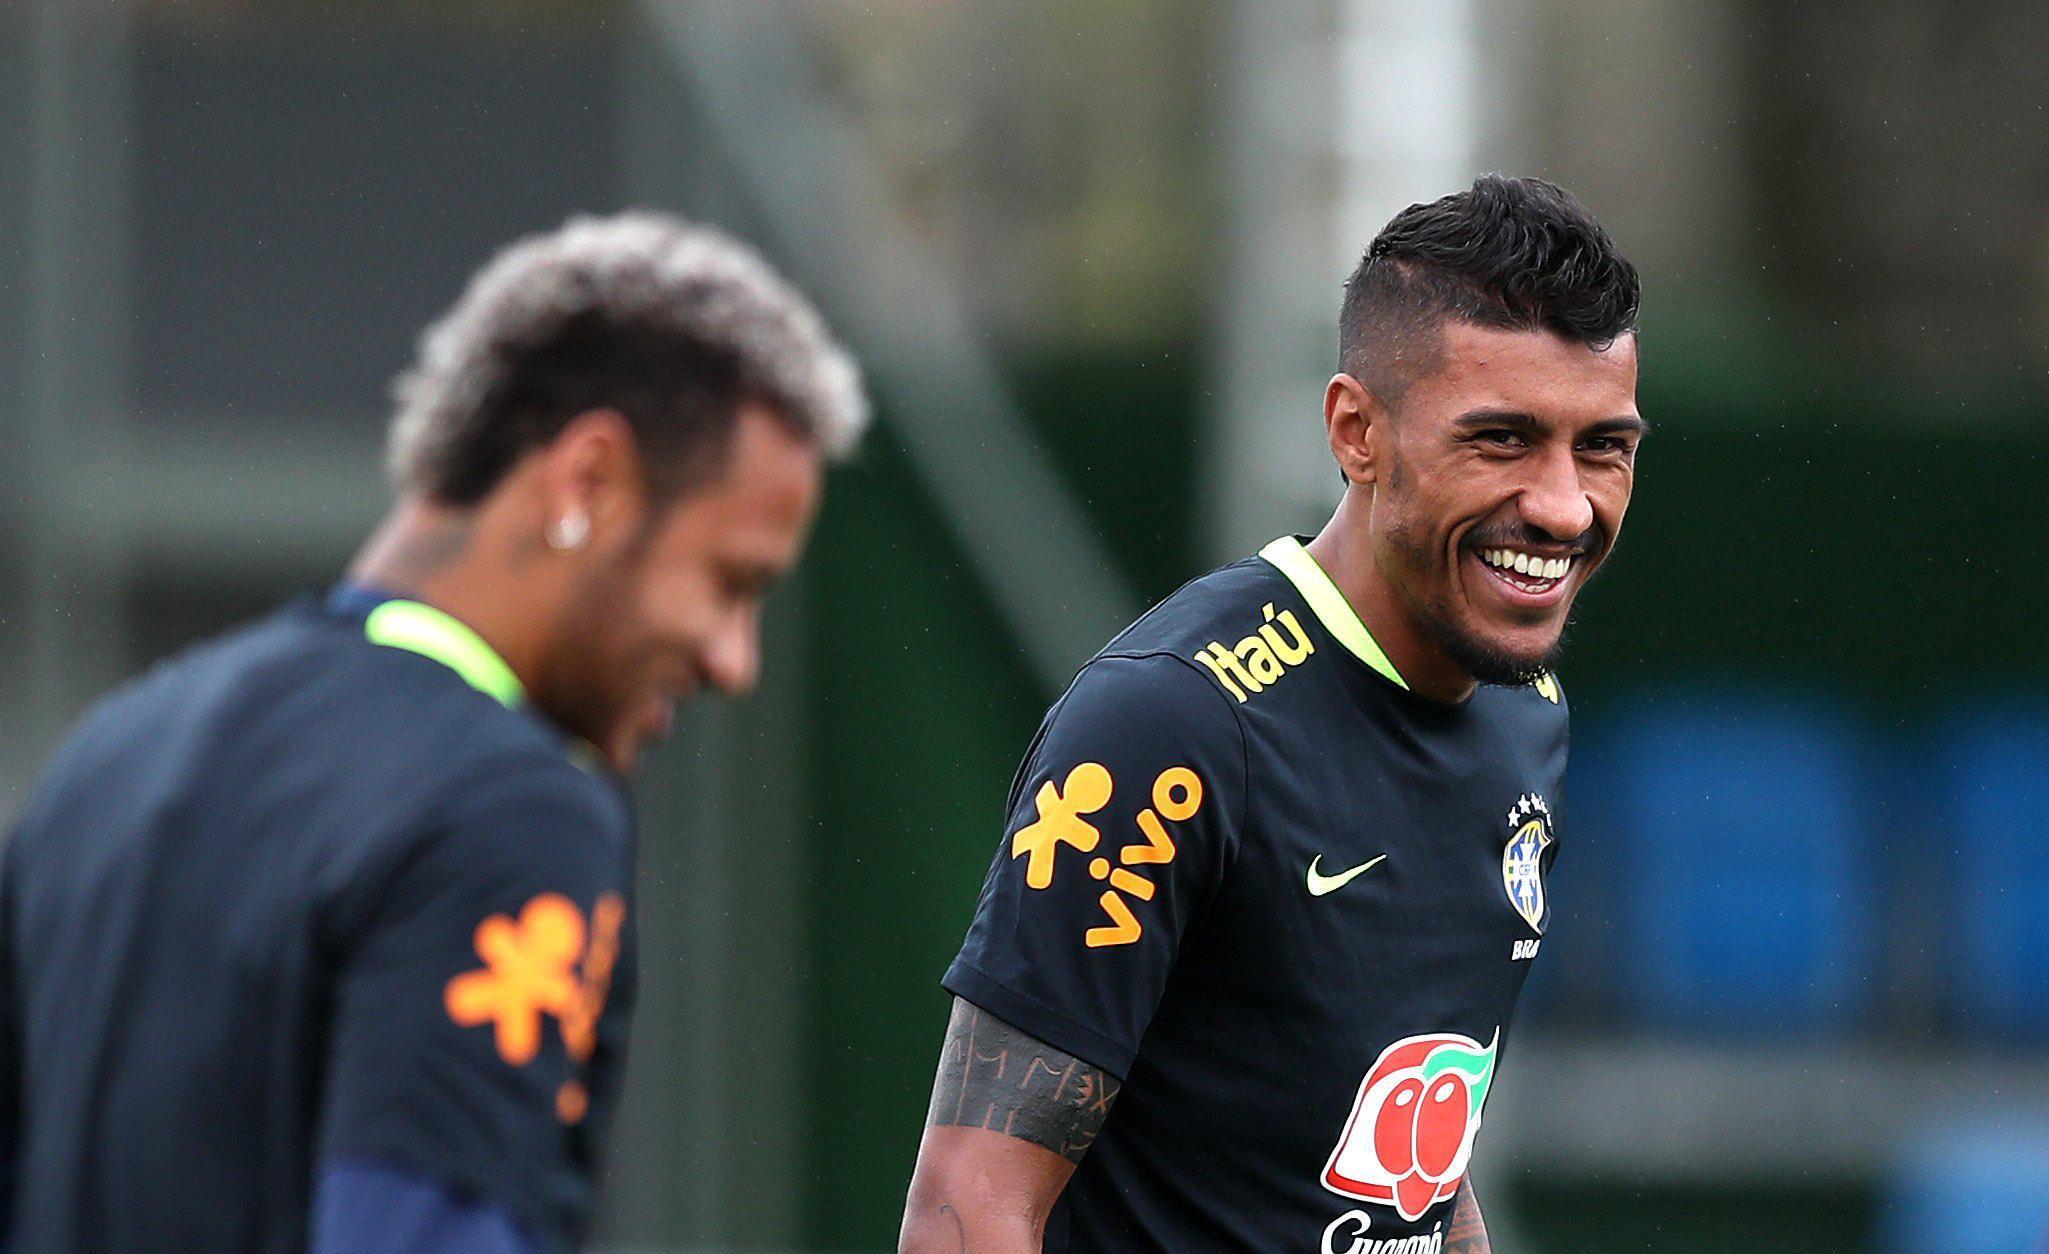 Neymar and Paulinho, having a laugh before Paulinho batters him